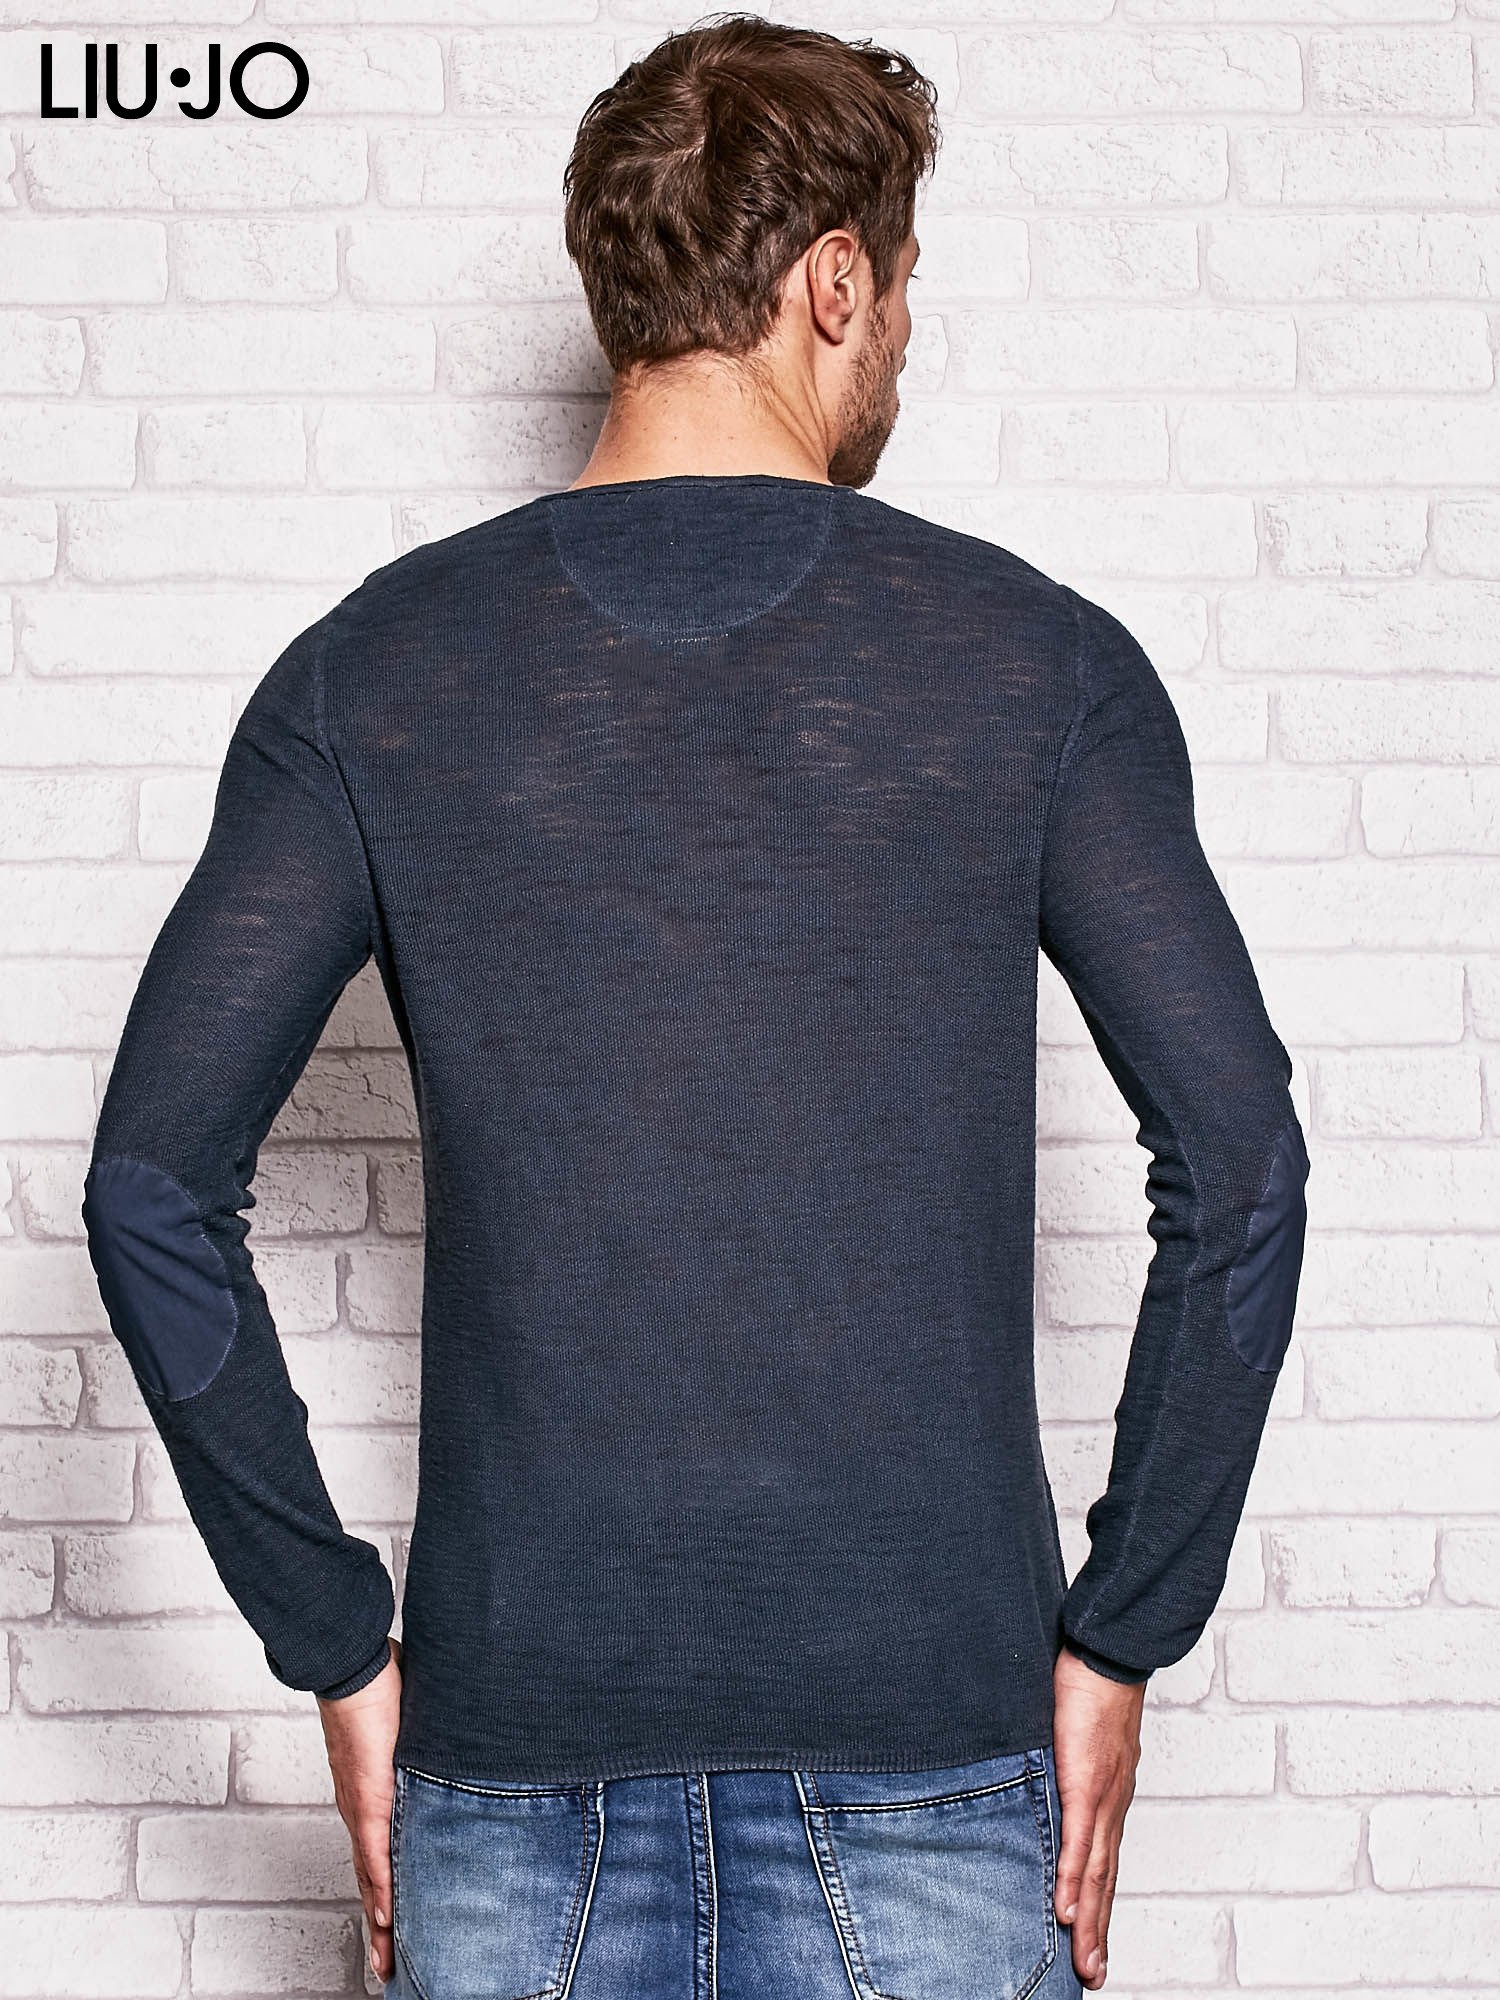 LIU JO Grafitowa bluzka męska z guzikami